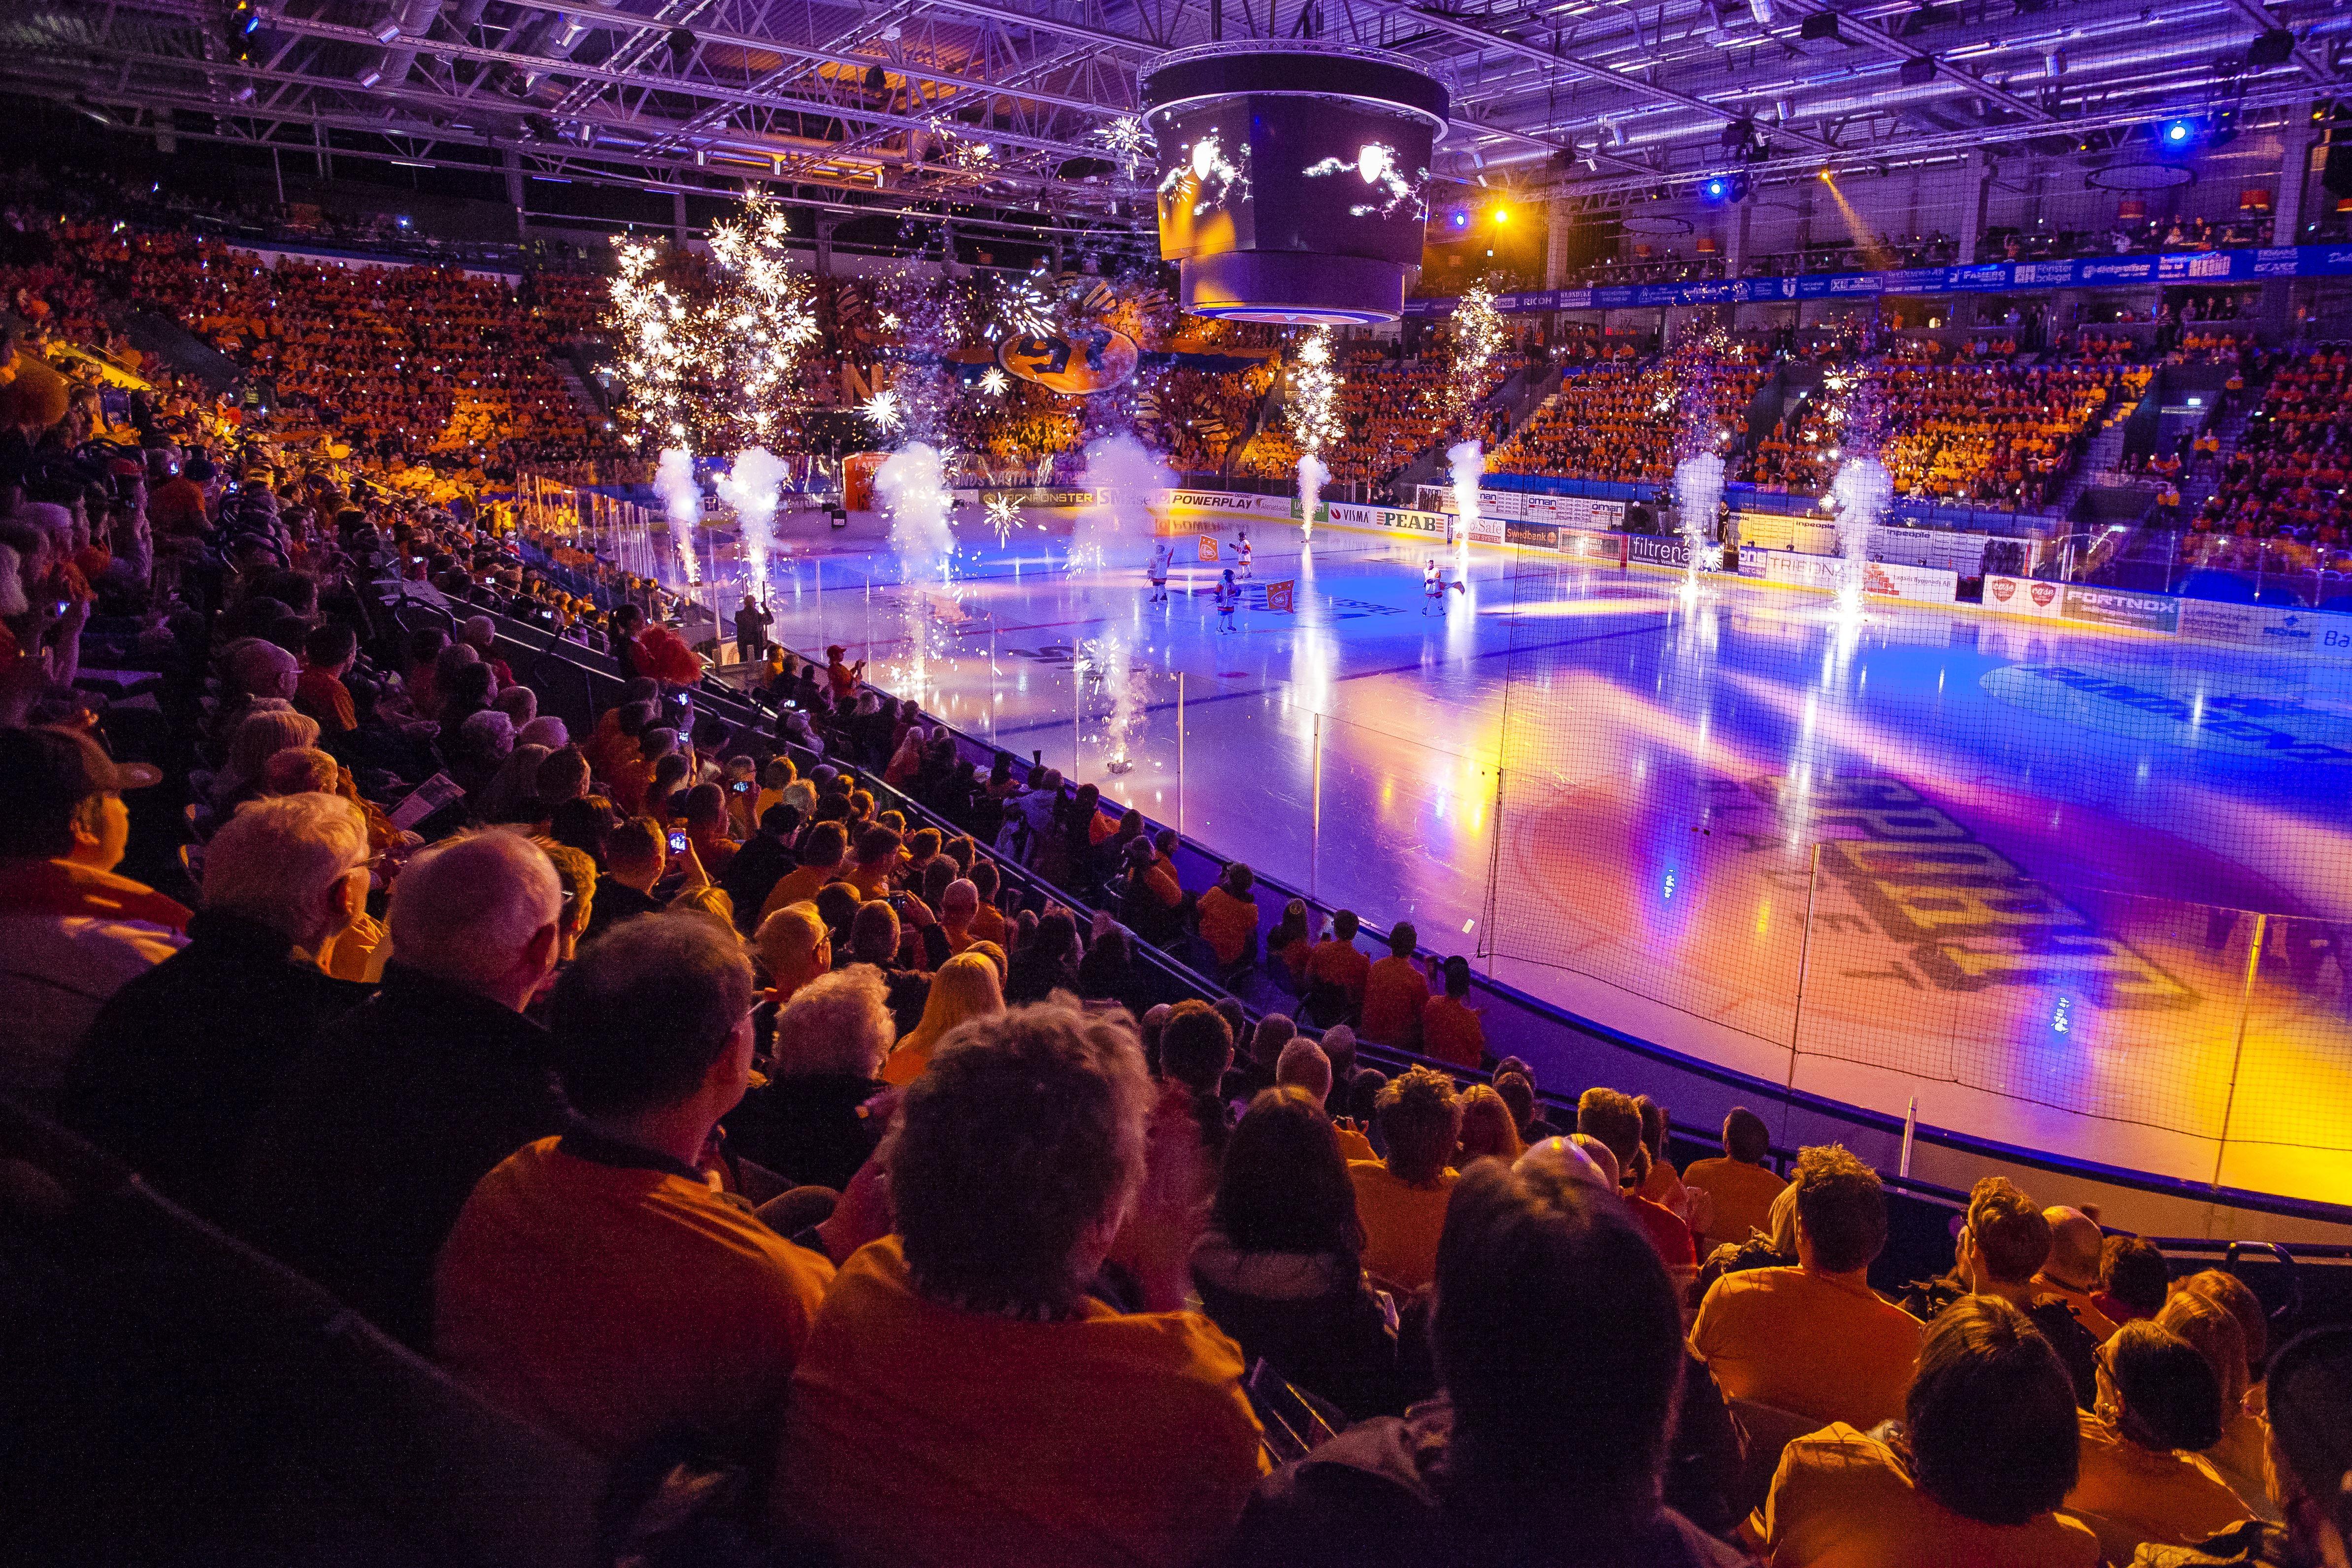 Ishockey:  Växjö Lakers  -  HV71 Jönköping